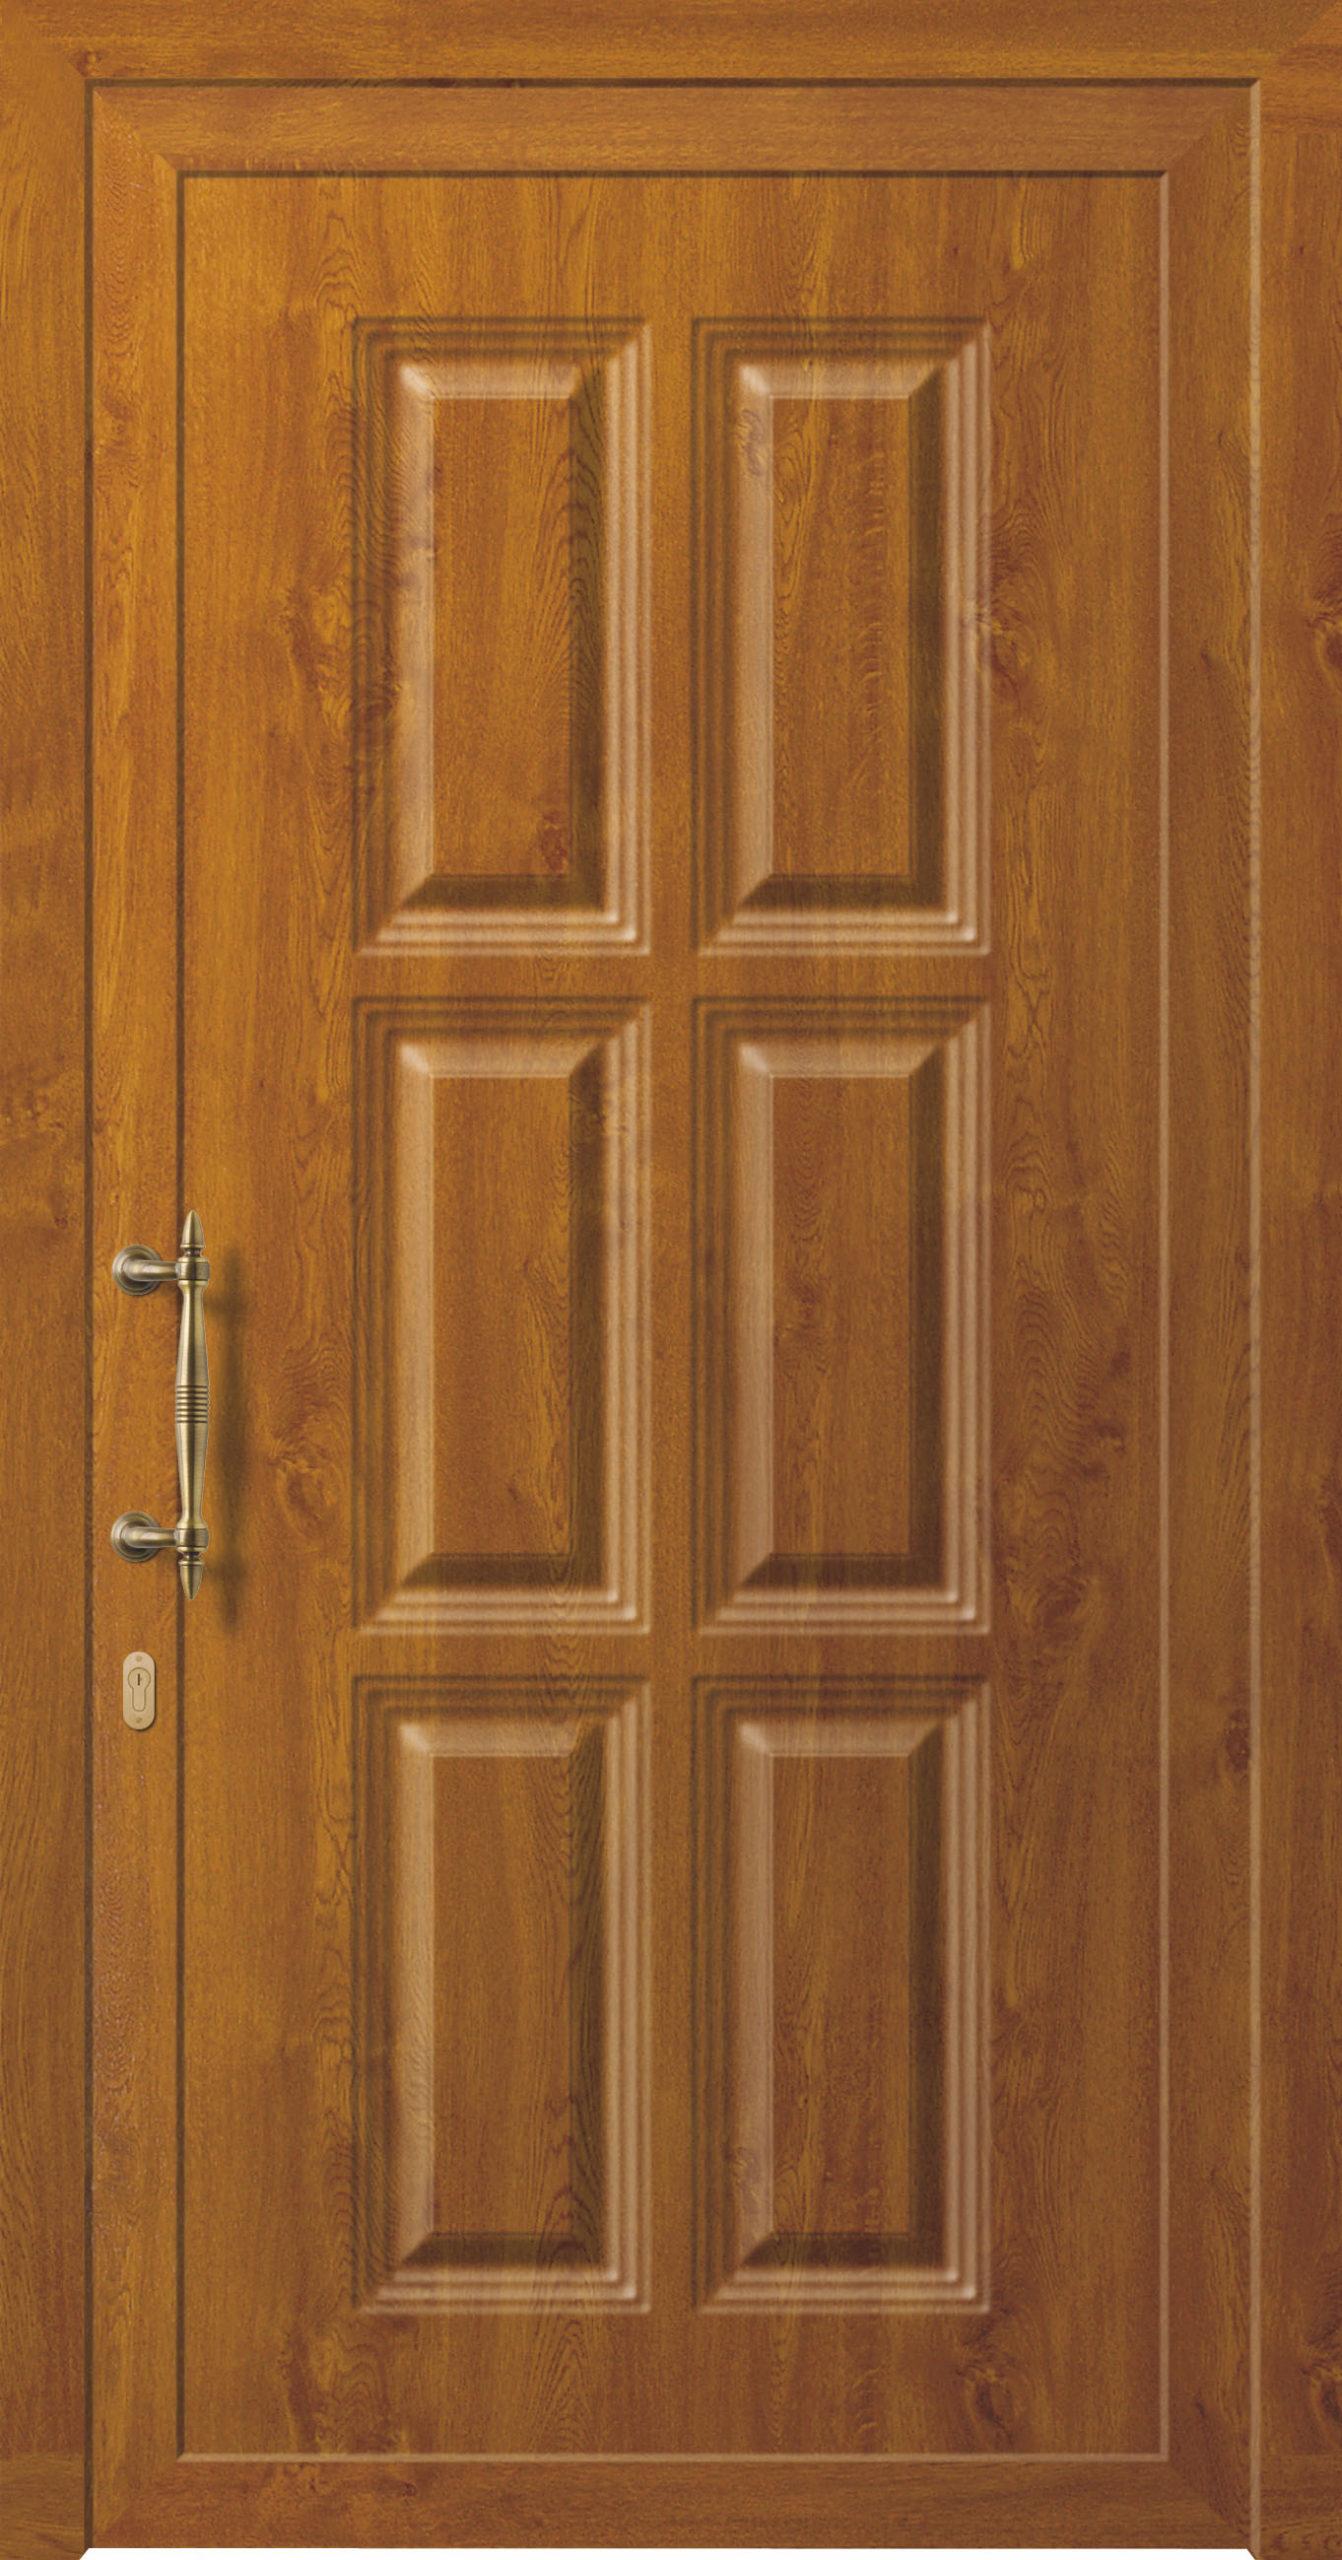 Entry Doors Linea Classica 126